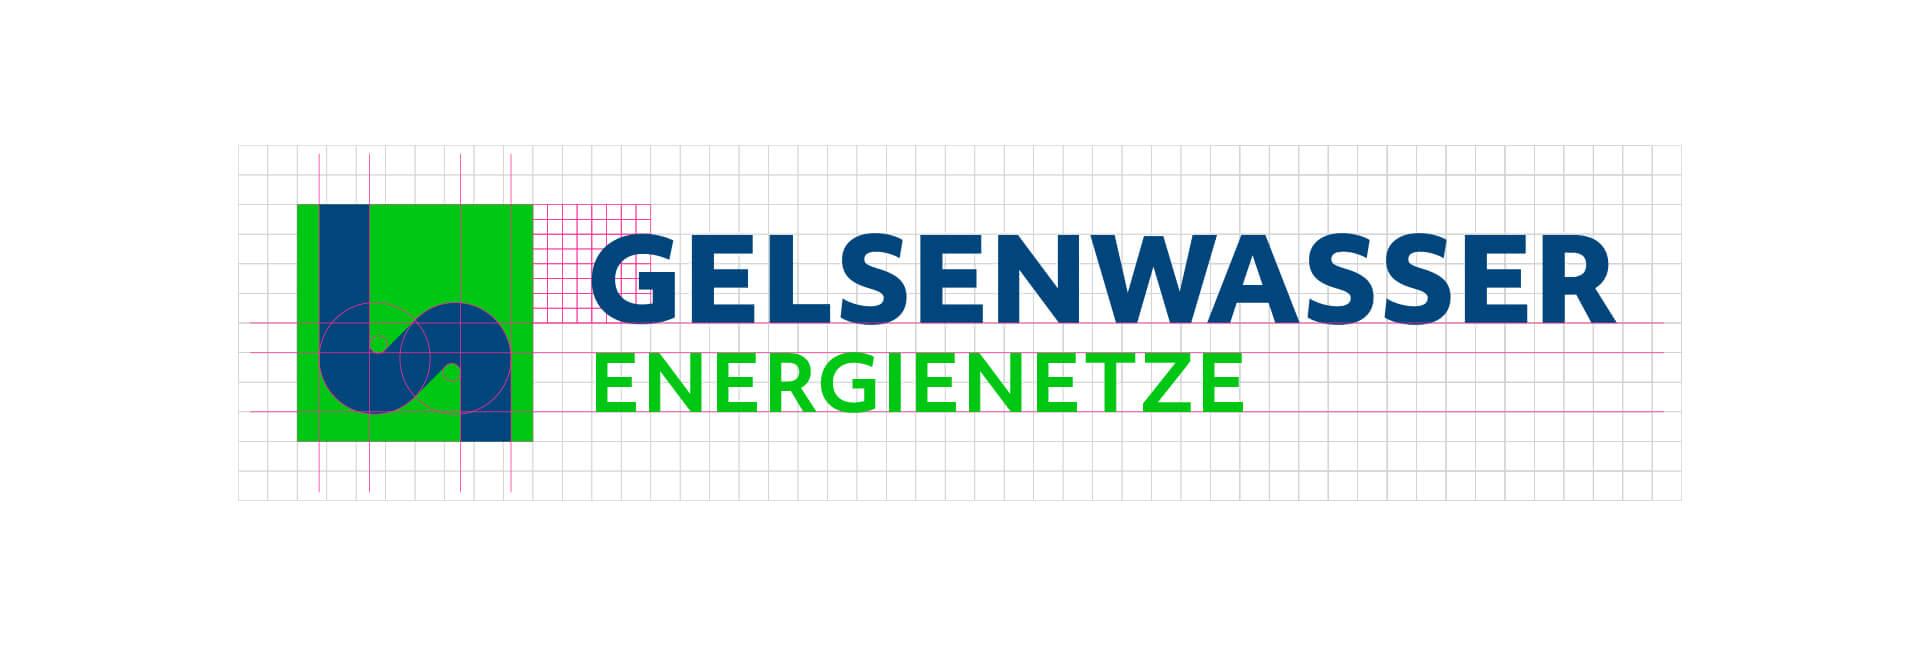 Raster-Gelsenwasser-logo